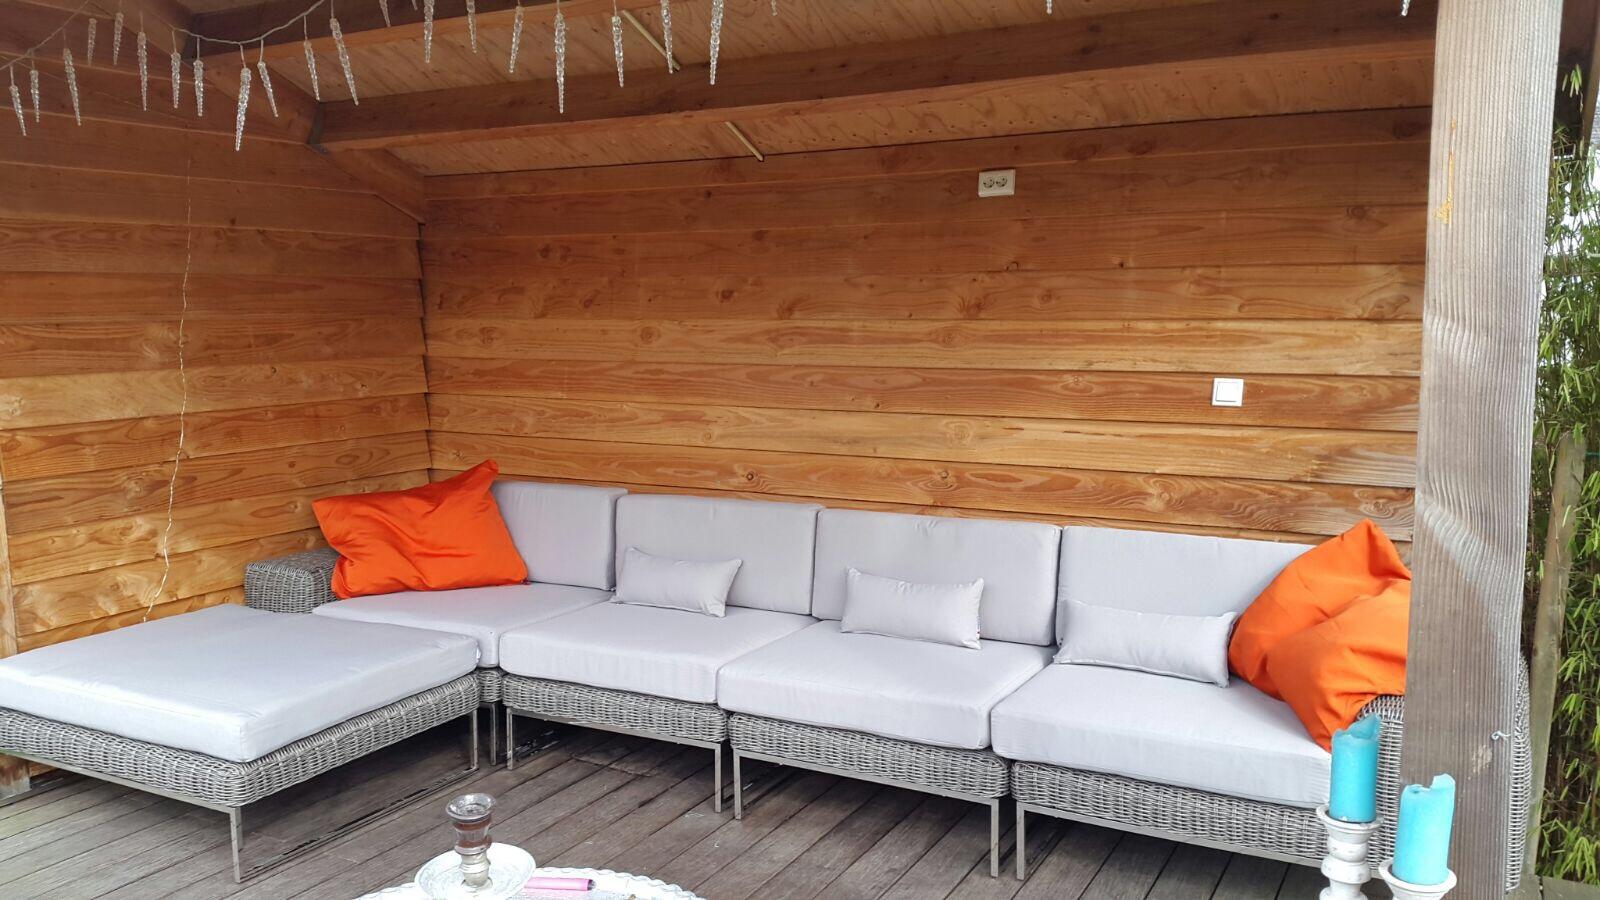 Arbrini design tuinmeubelen maart 2017 - Bank terras hout ...